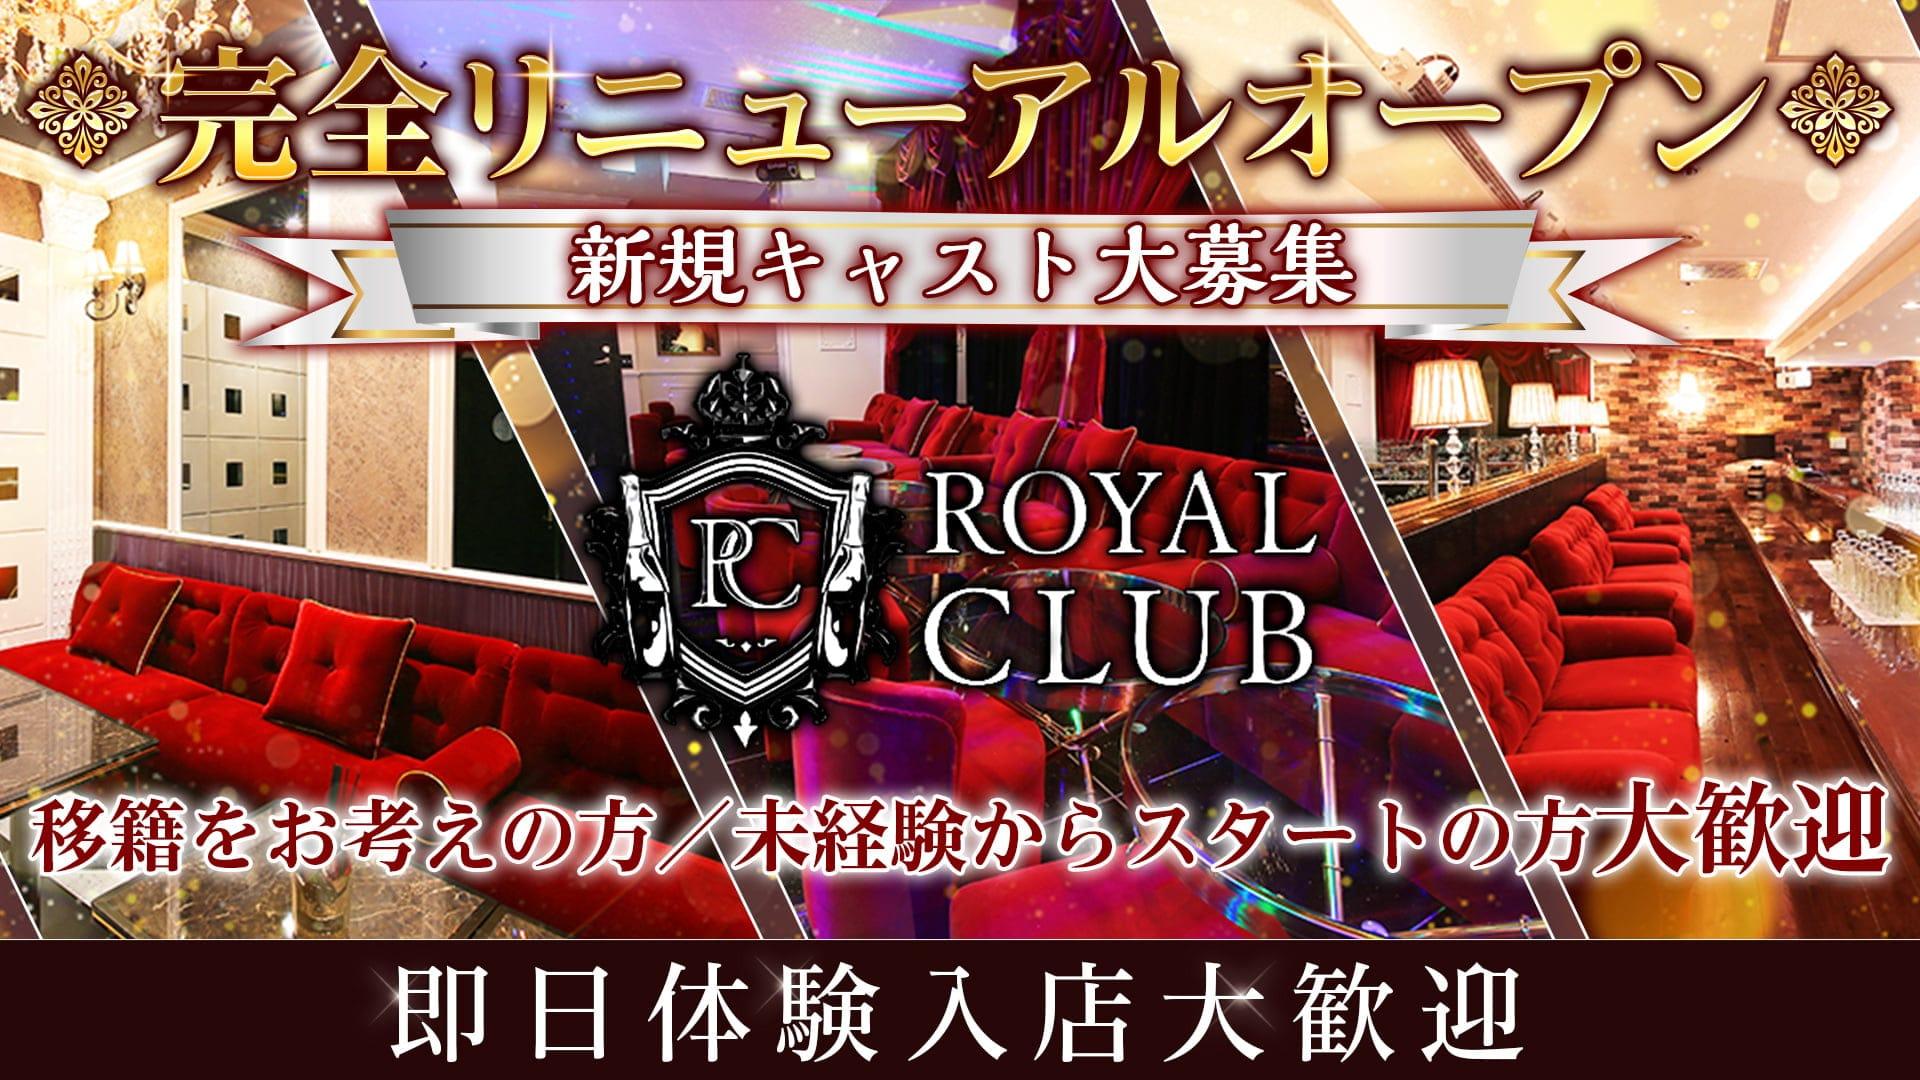 ROYAL CLUB(ロイヤルクラブ)【公式求人・体入情報】 国分町キャバクラ TOP画像